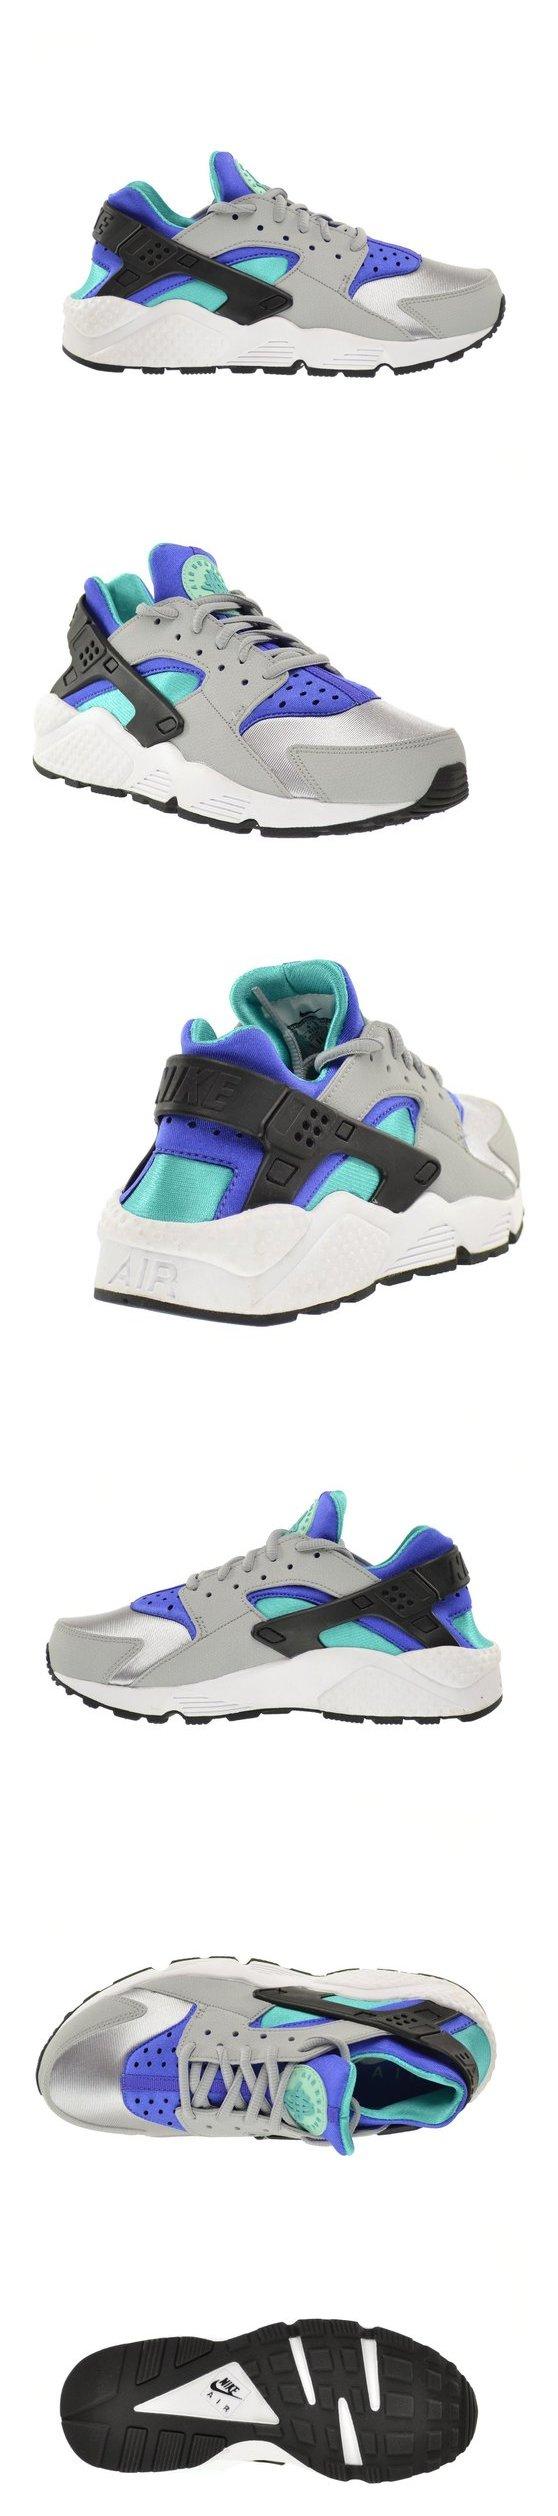 de98514a0425  120 - Nike Air Huarache Run Women s Shoes Wolf Grey Light Retro-Artisan  Teal-Persian Violet 634835-008  nike